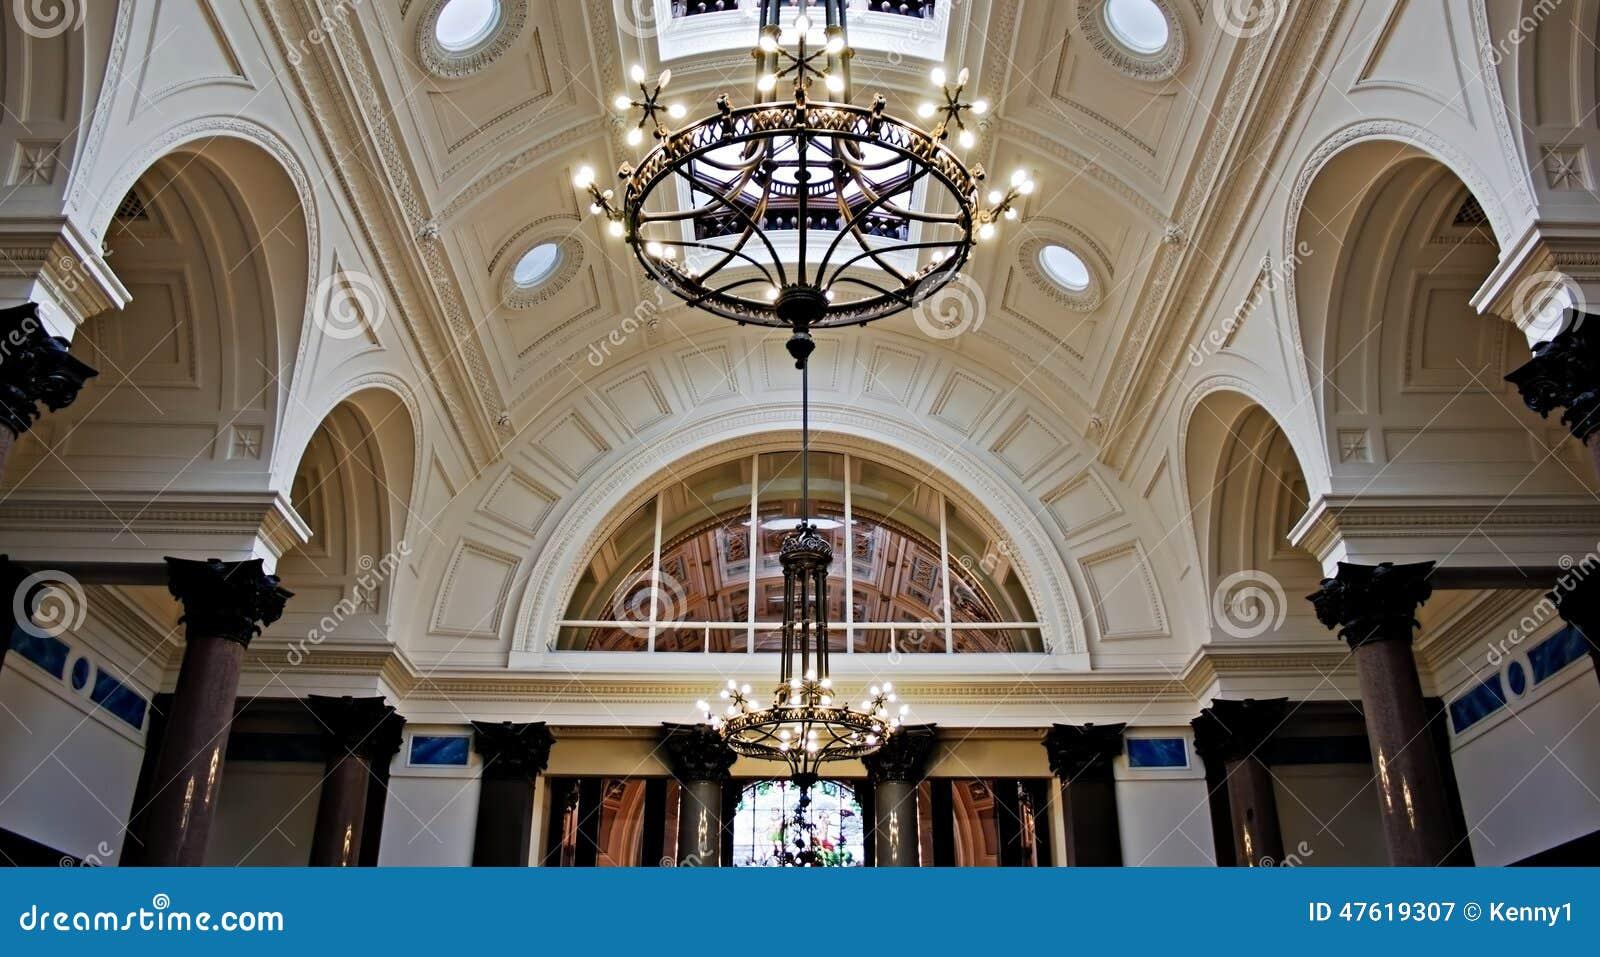 Beautiful ornate plaster ceiling